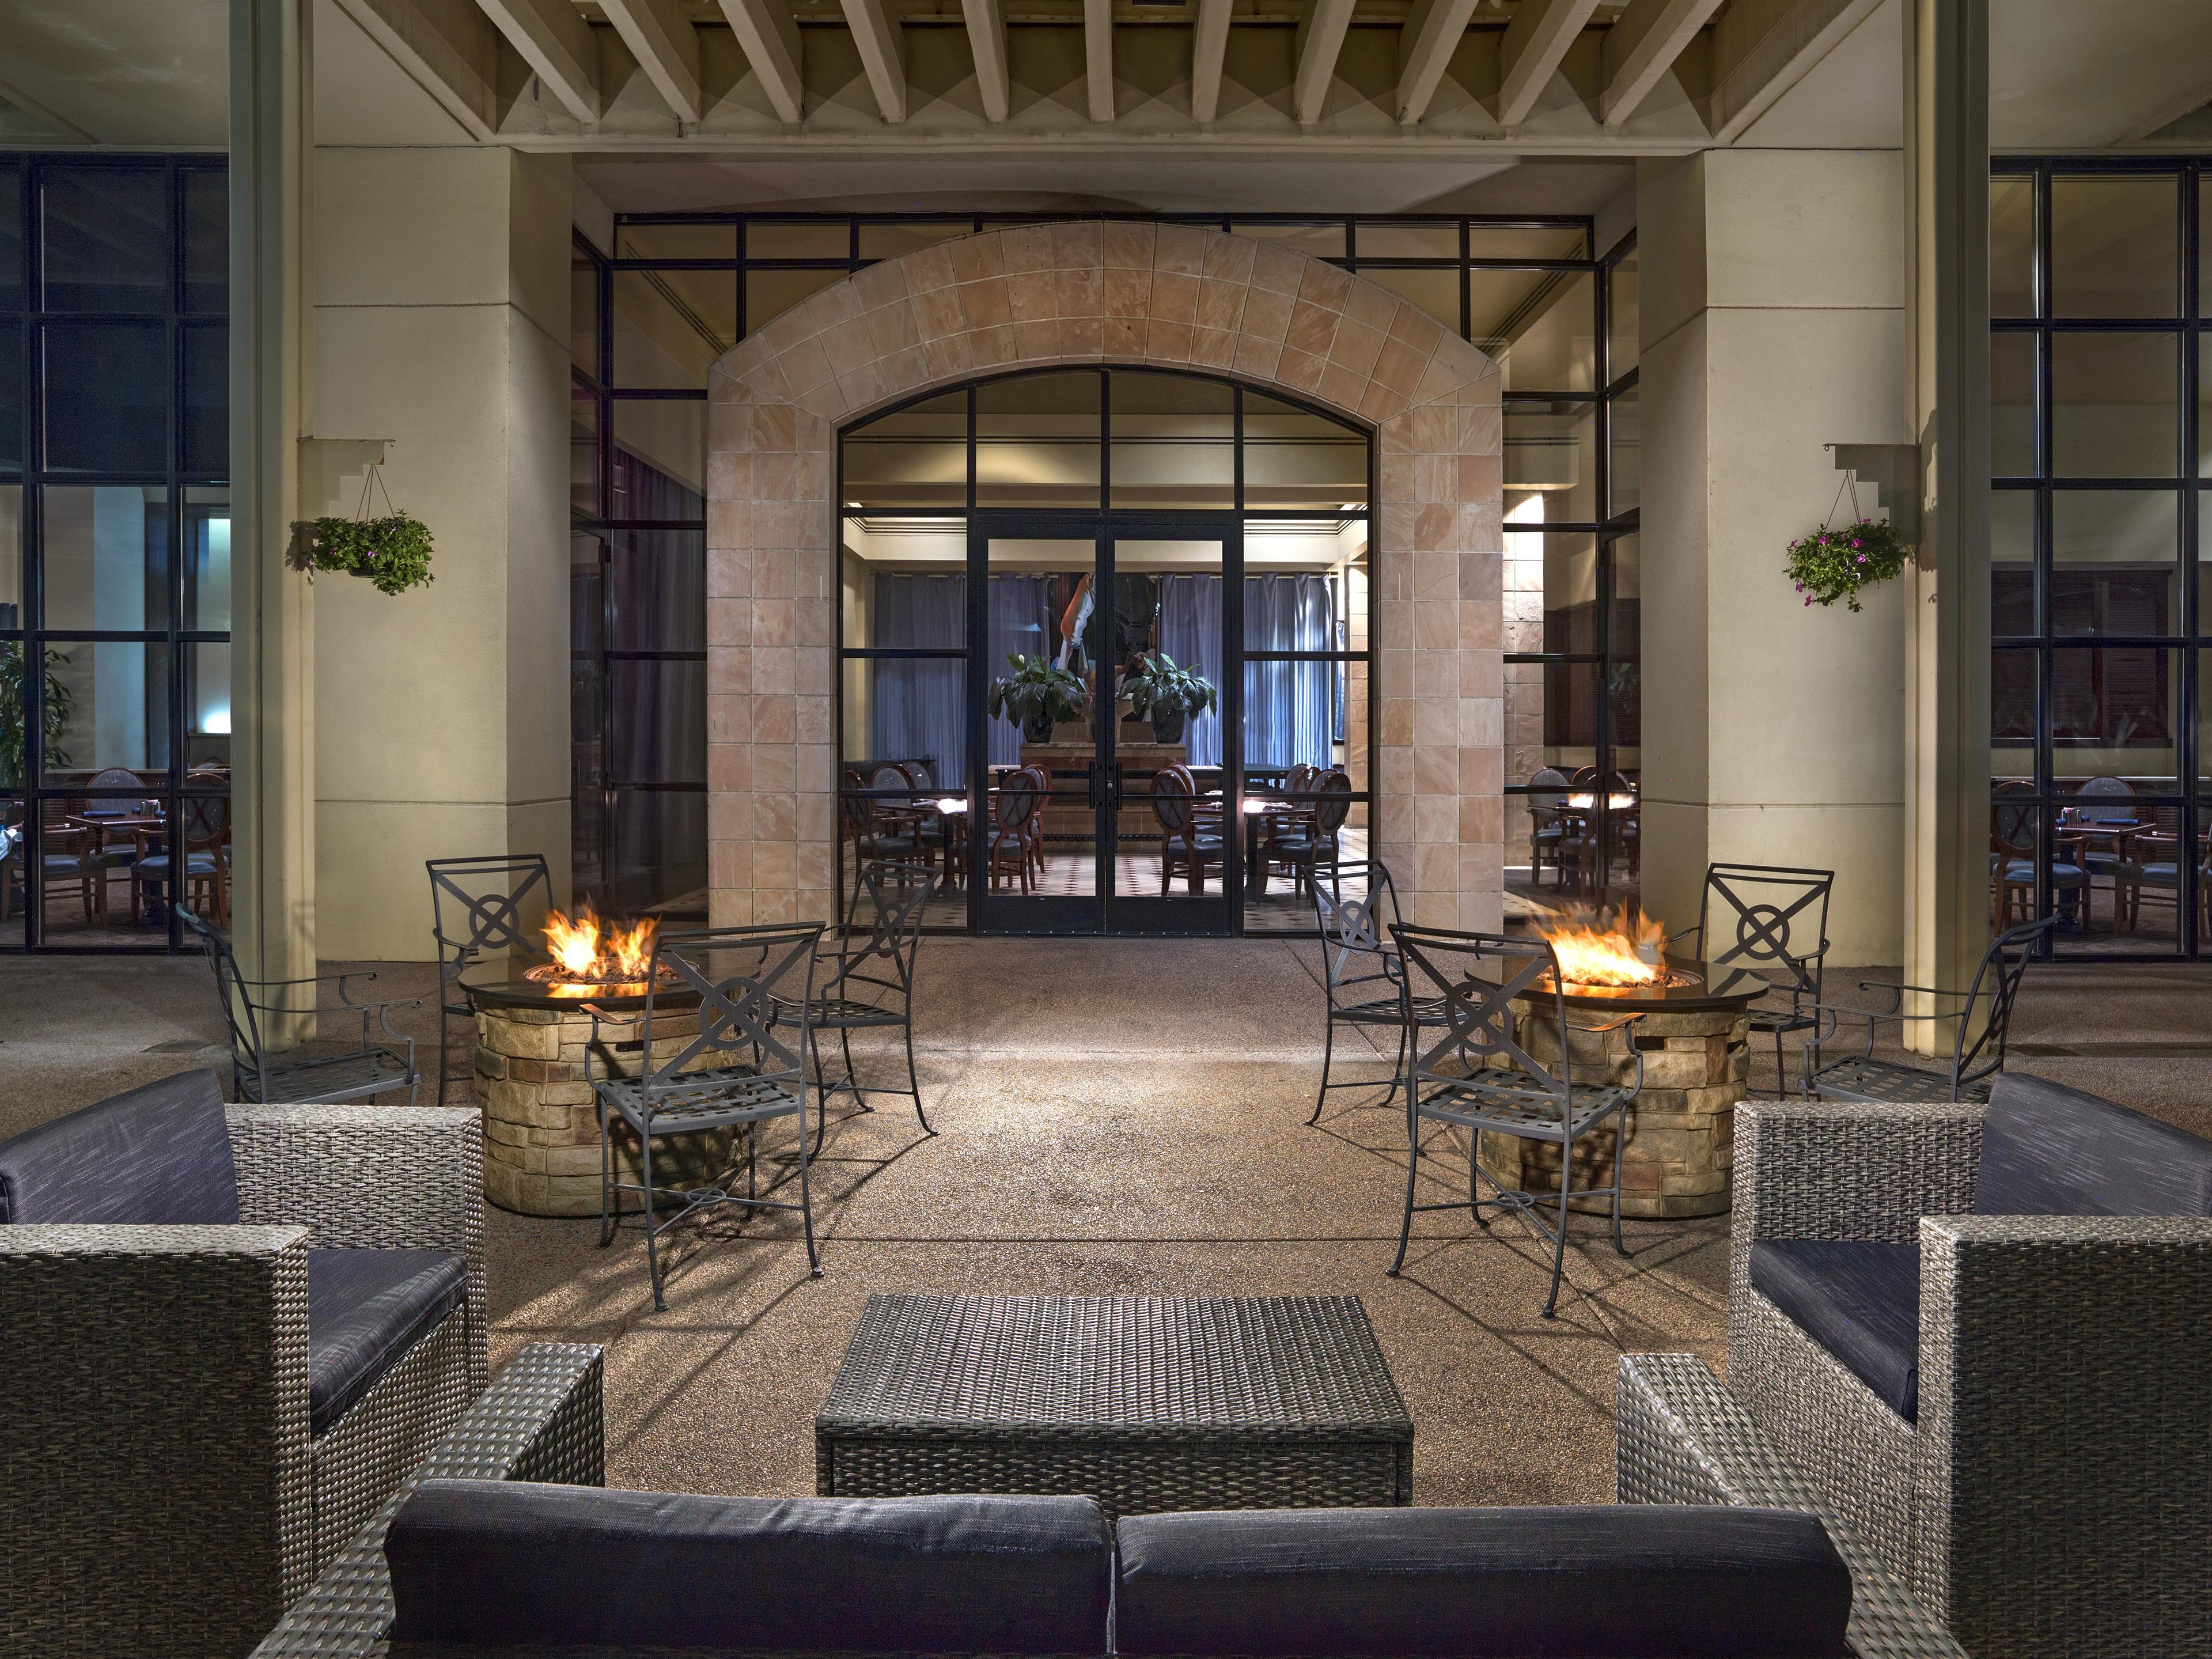 Sheraton Crescent Hotel image 16